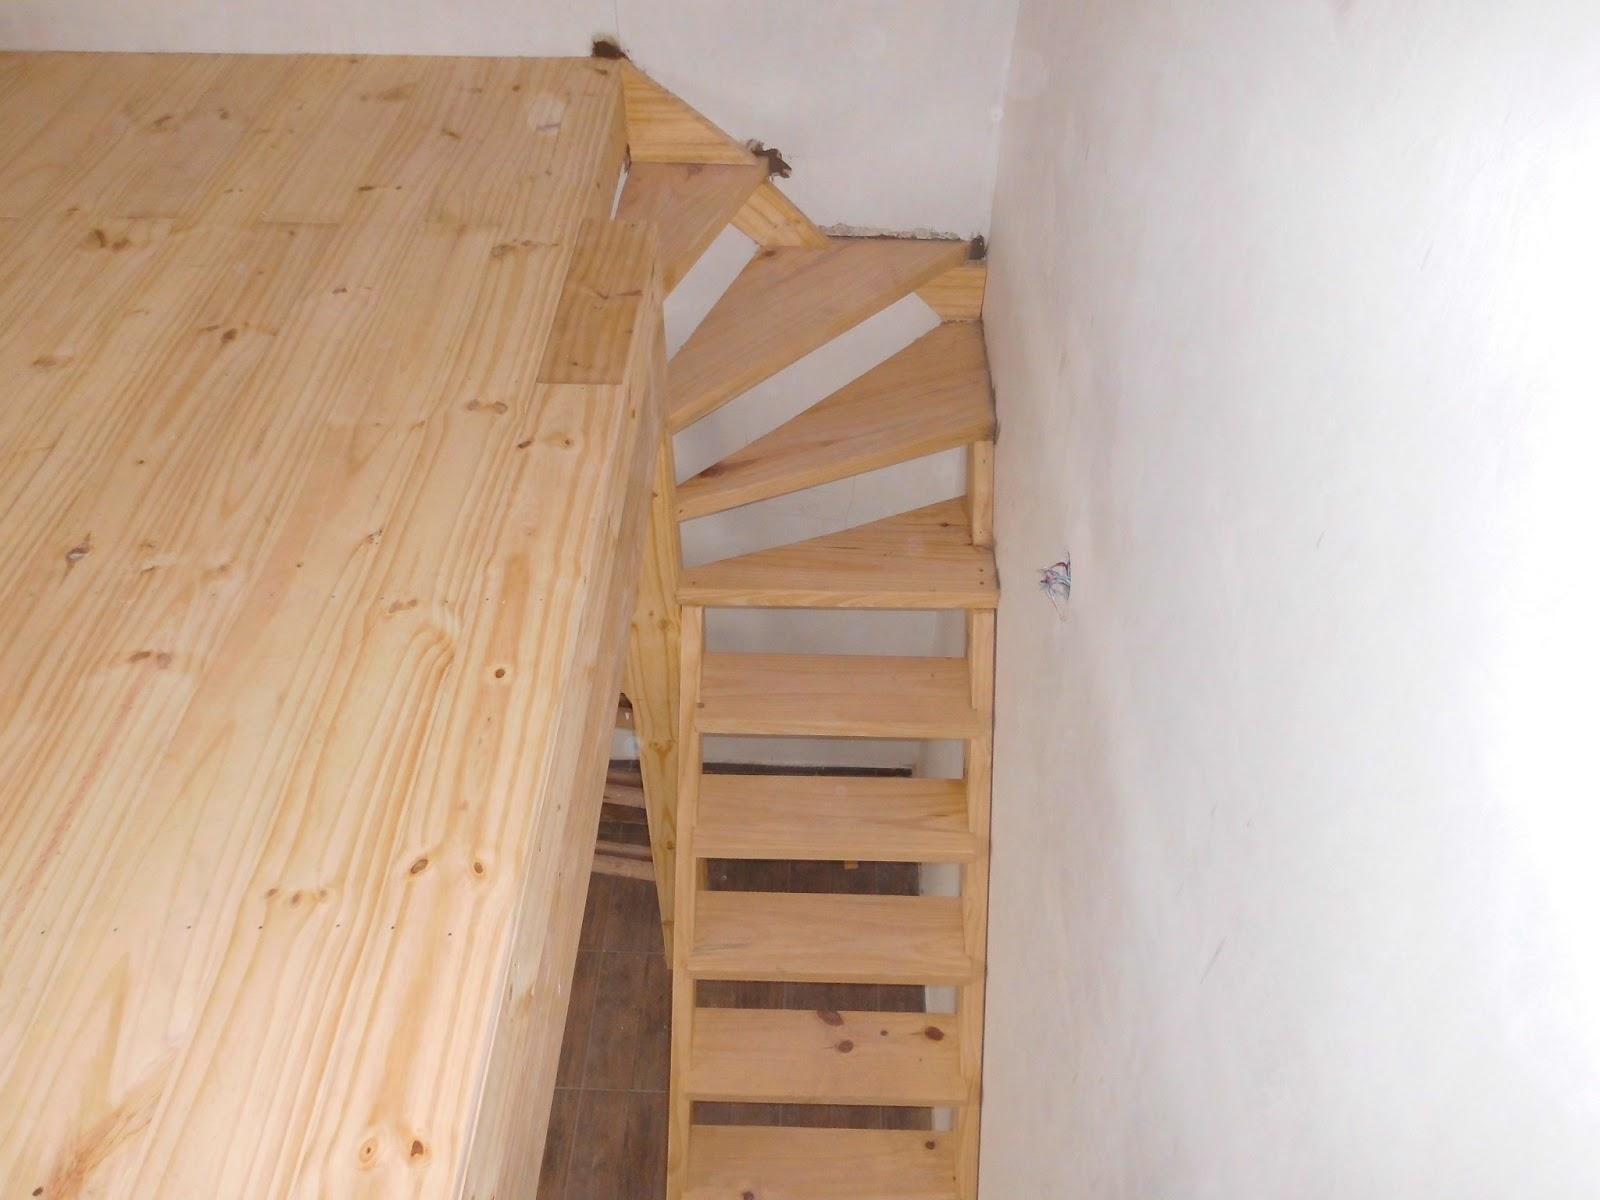 Entrepisos de madera escaleras escaleras for Espacio escalera